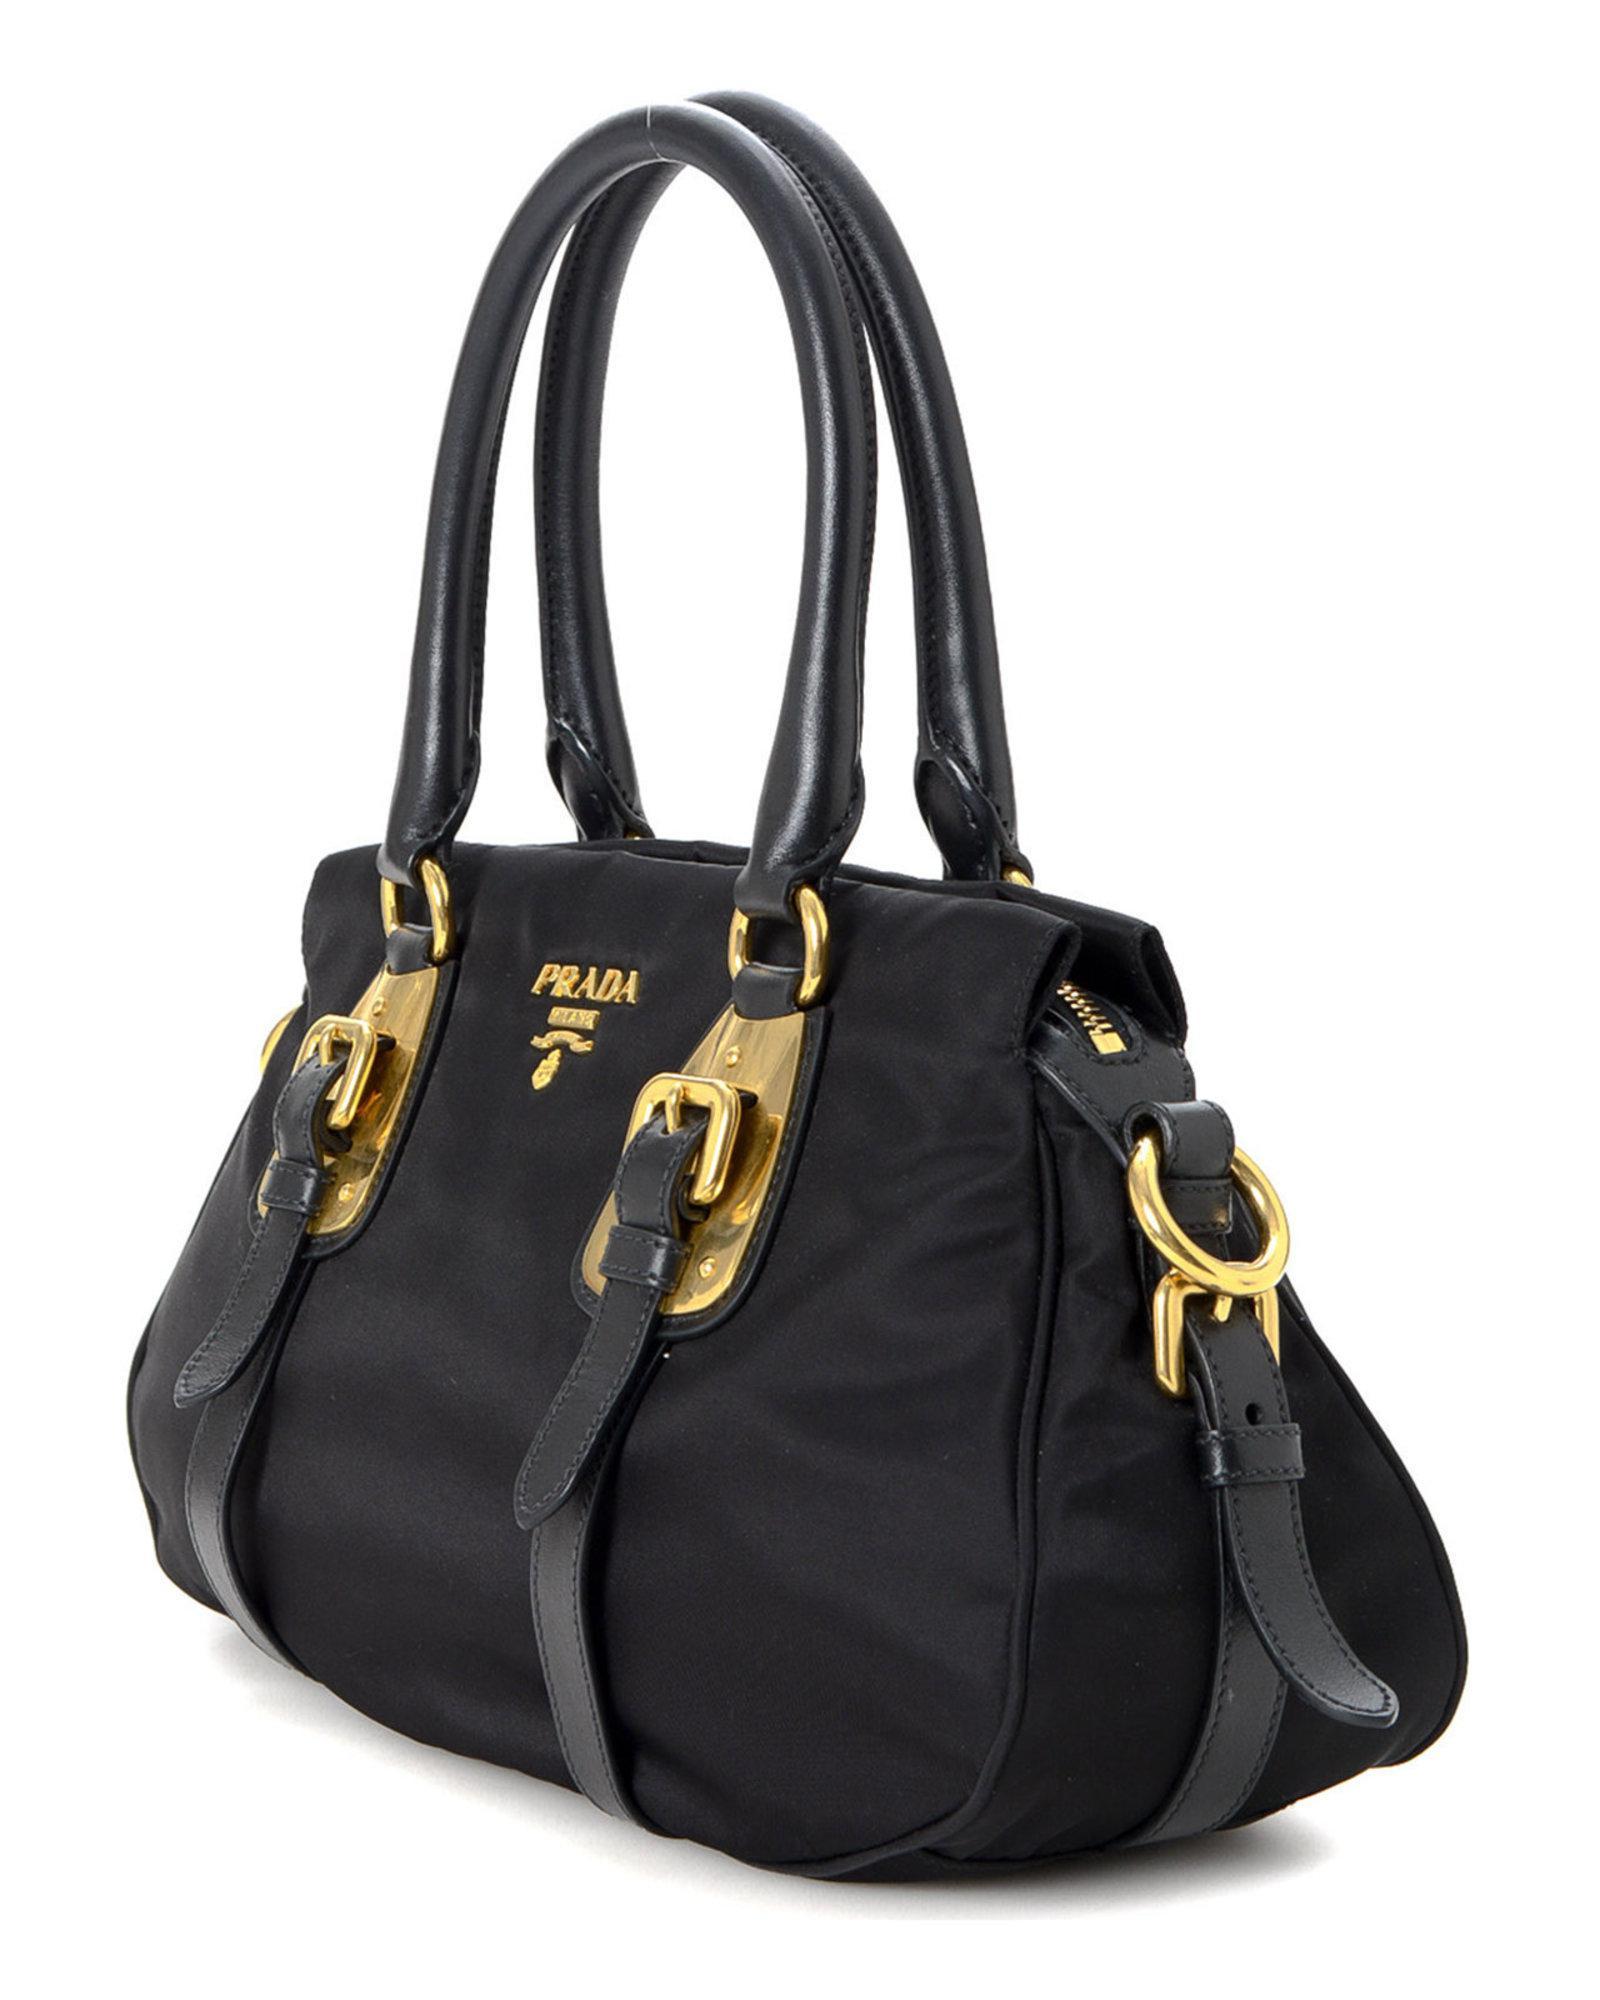 Lyst - Prada Tessuto Two Way Handbag - Vintage in Black 443a91fba06d4